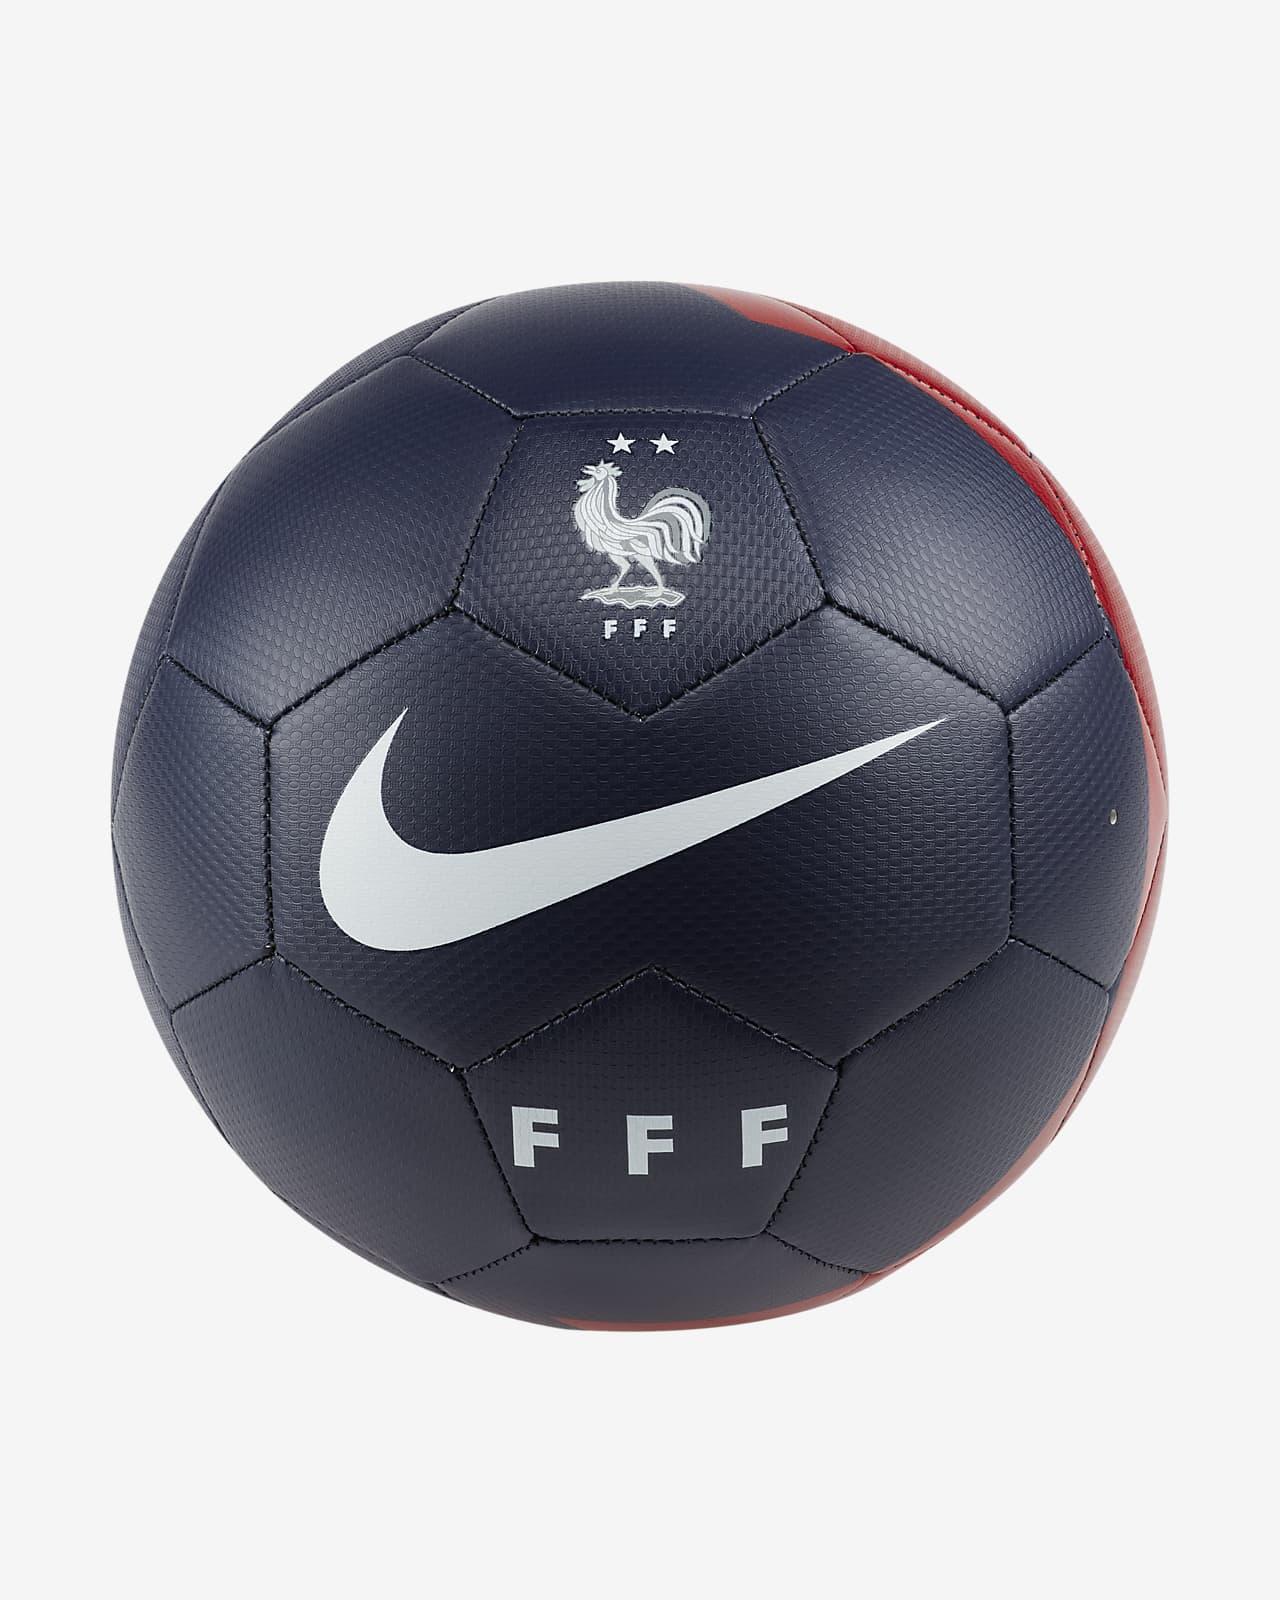 Balón de fútbol FFF Prestige